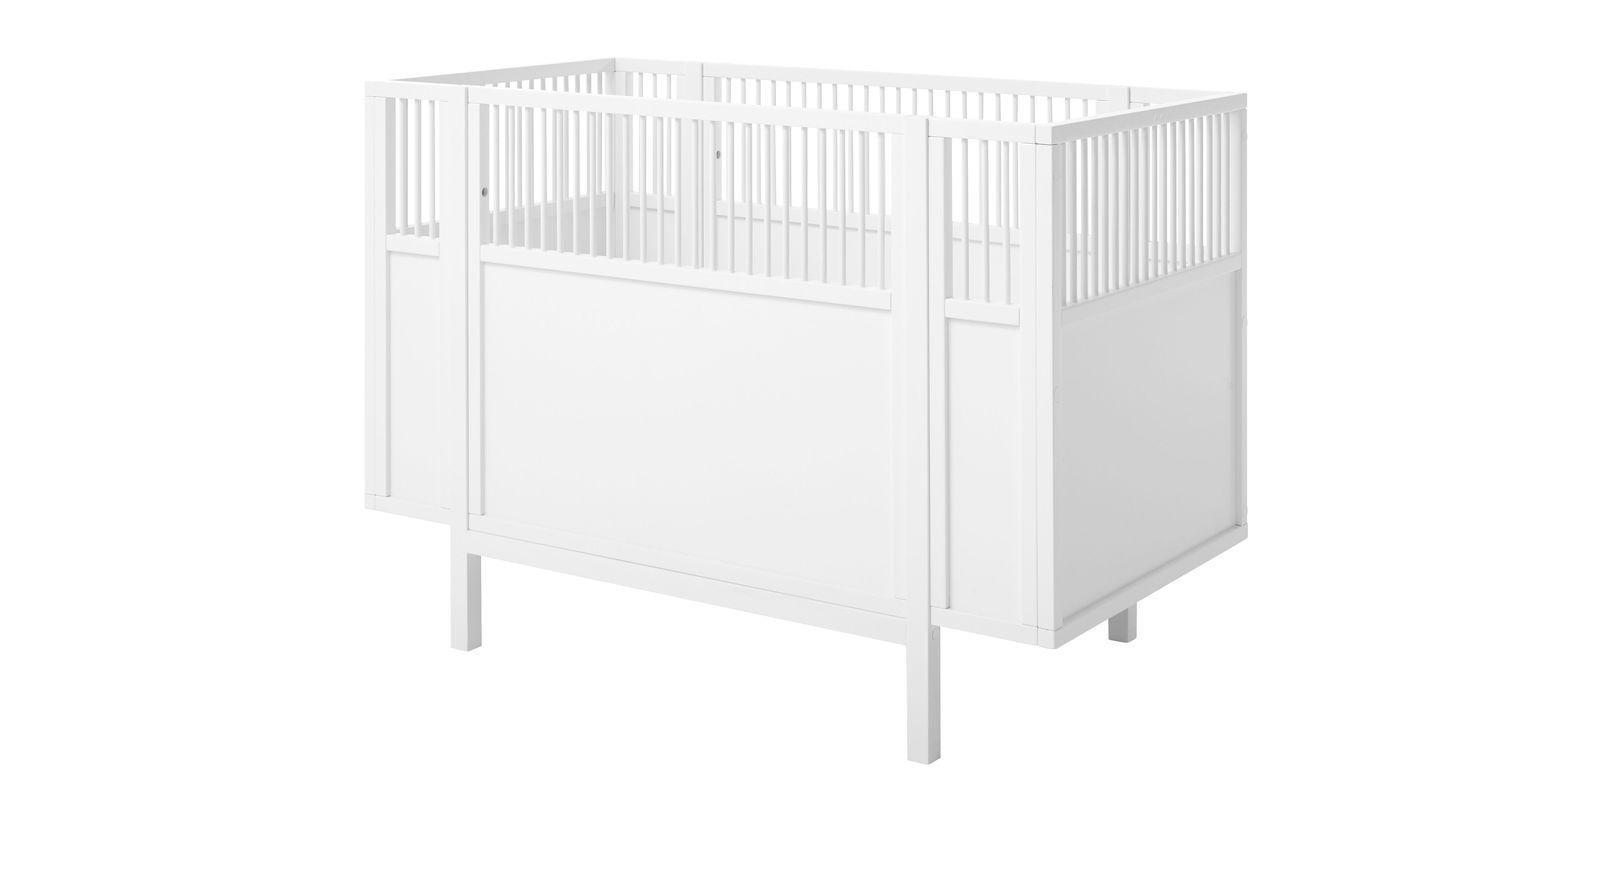 Trendiges LIFETIME Babybett Retro in Weiß lackiert